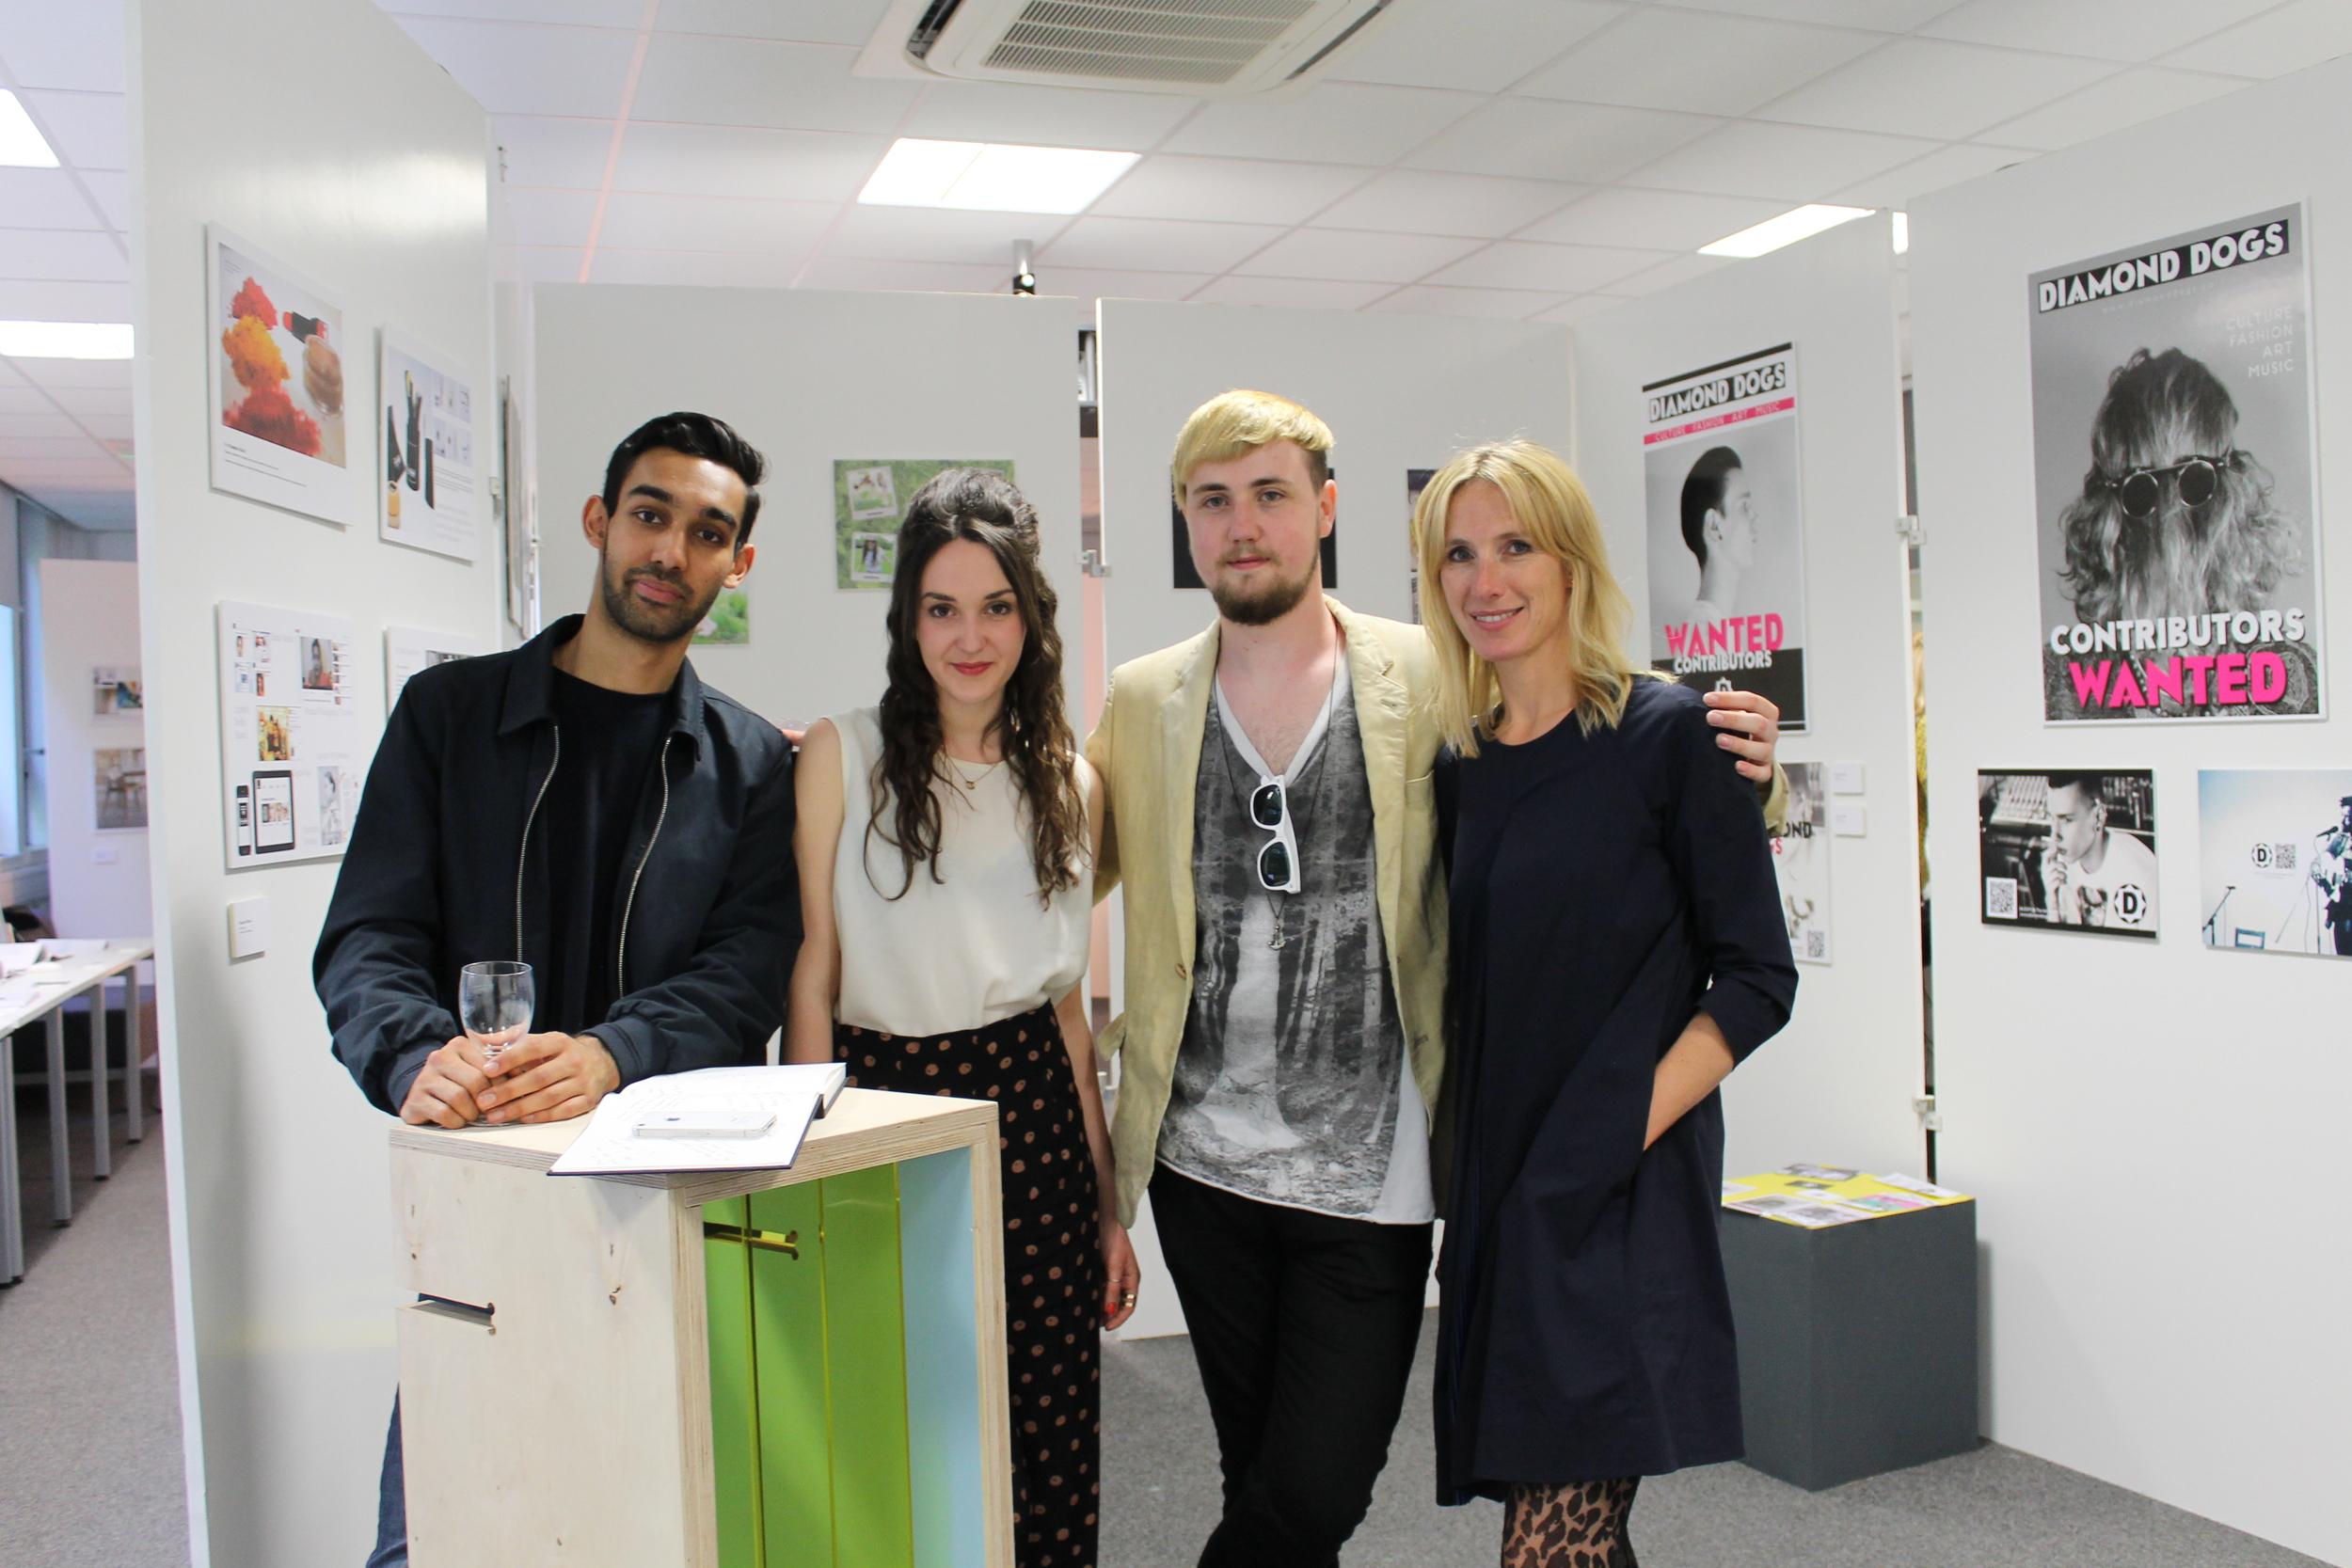 Students Ashwin Singh, Louisa Kimmins, Craig Ramsey with Programme Leader Amanda Bragg-Mollison (far right)